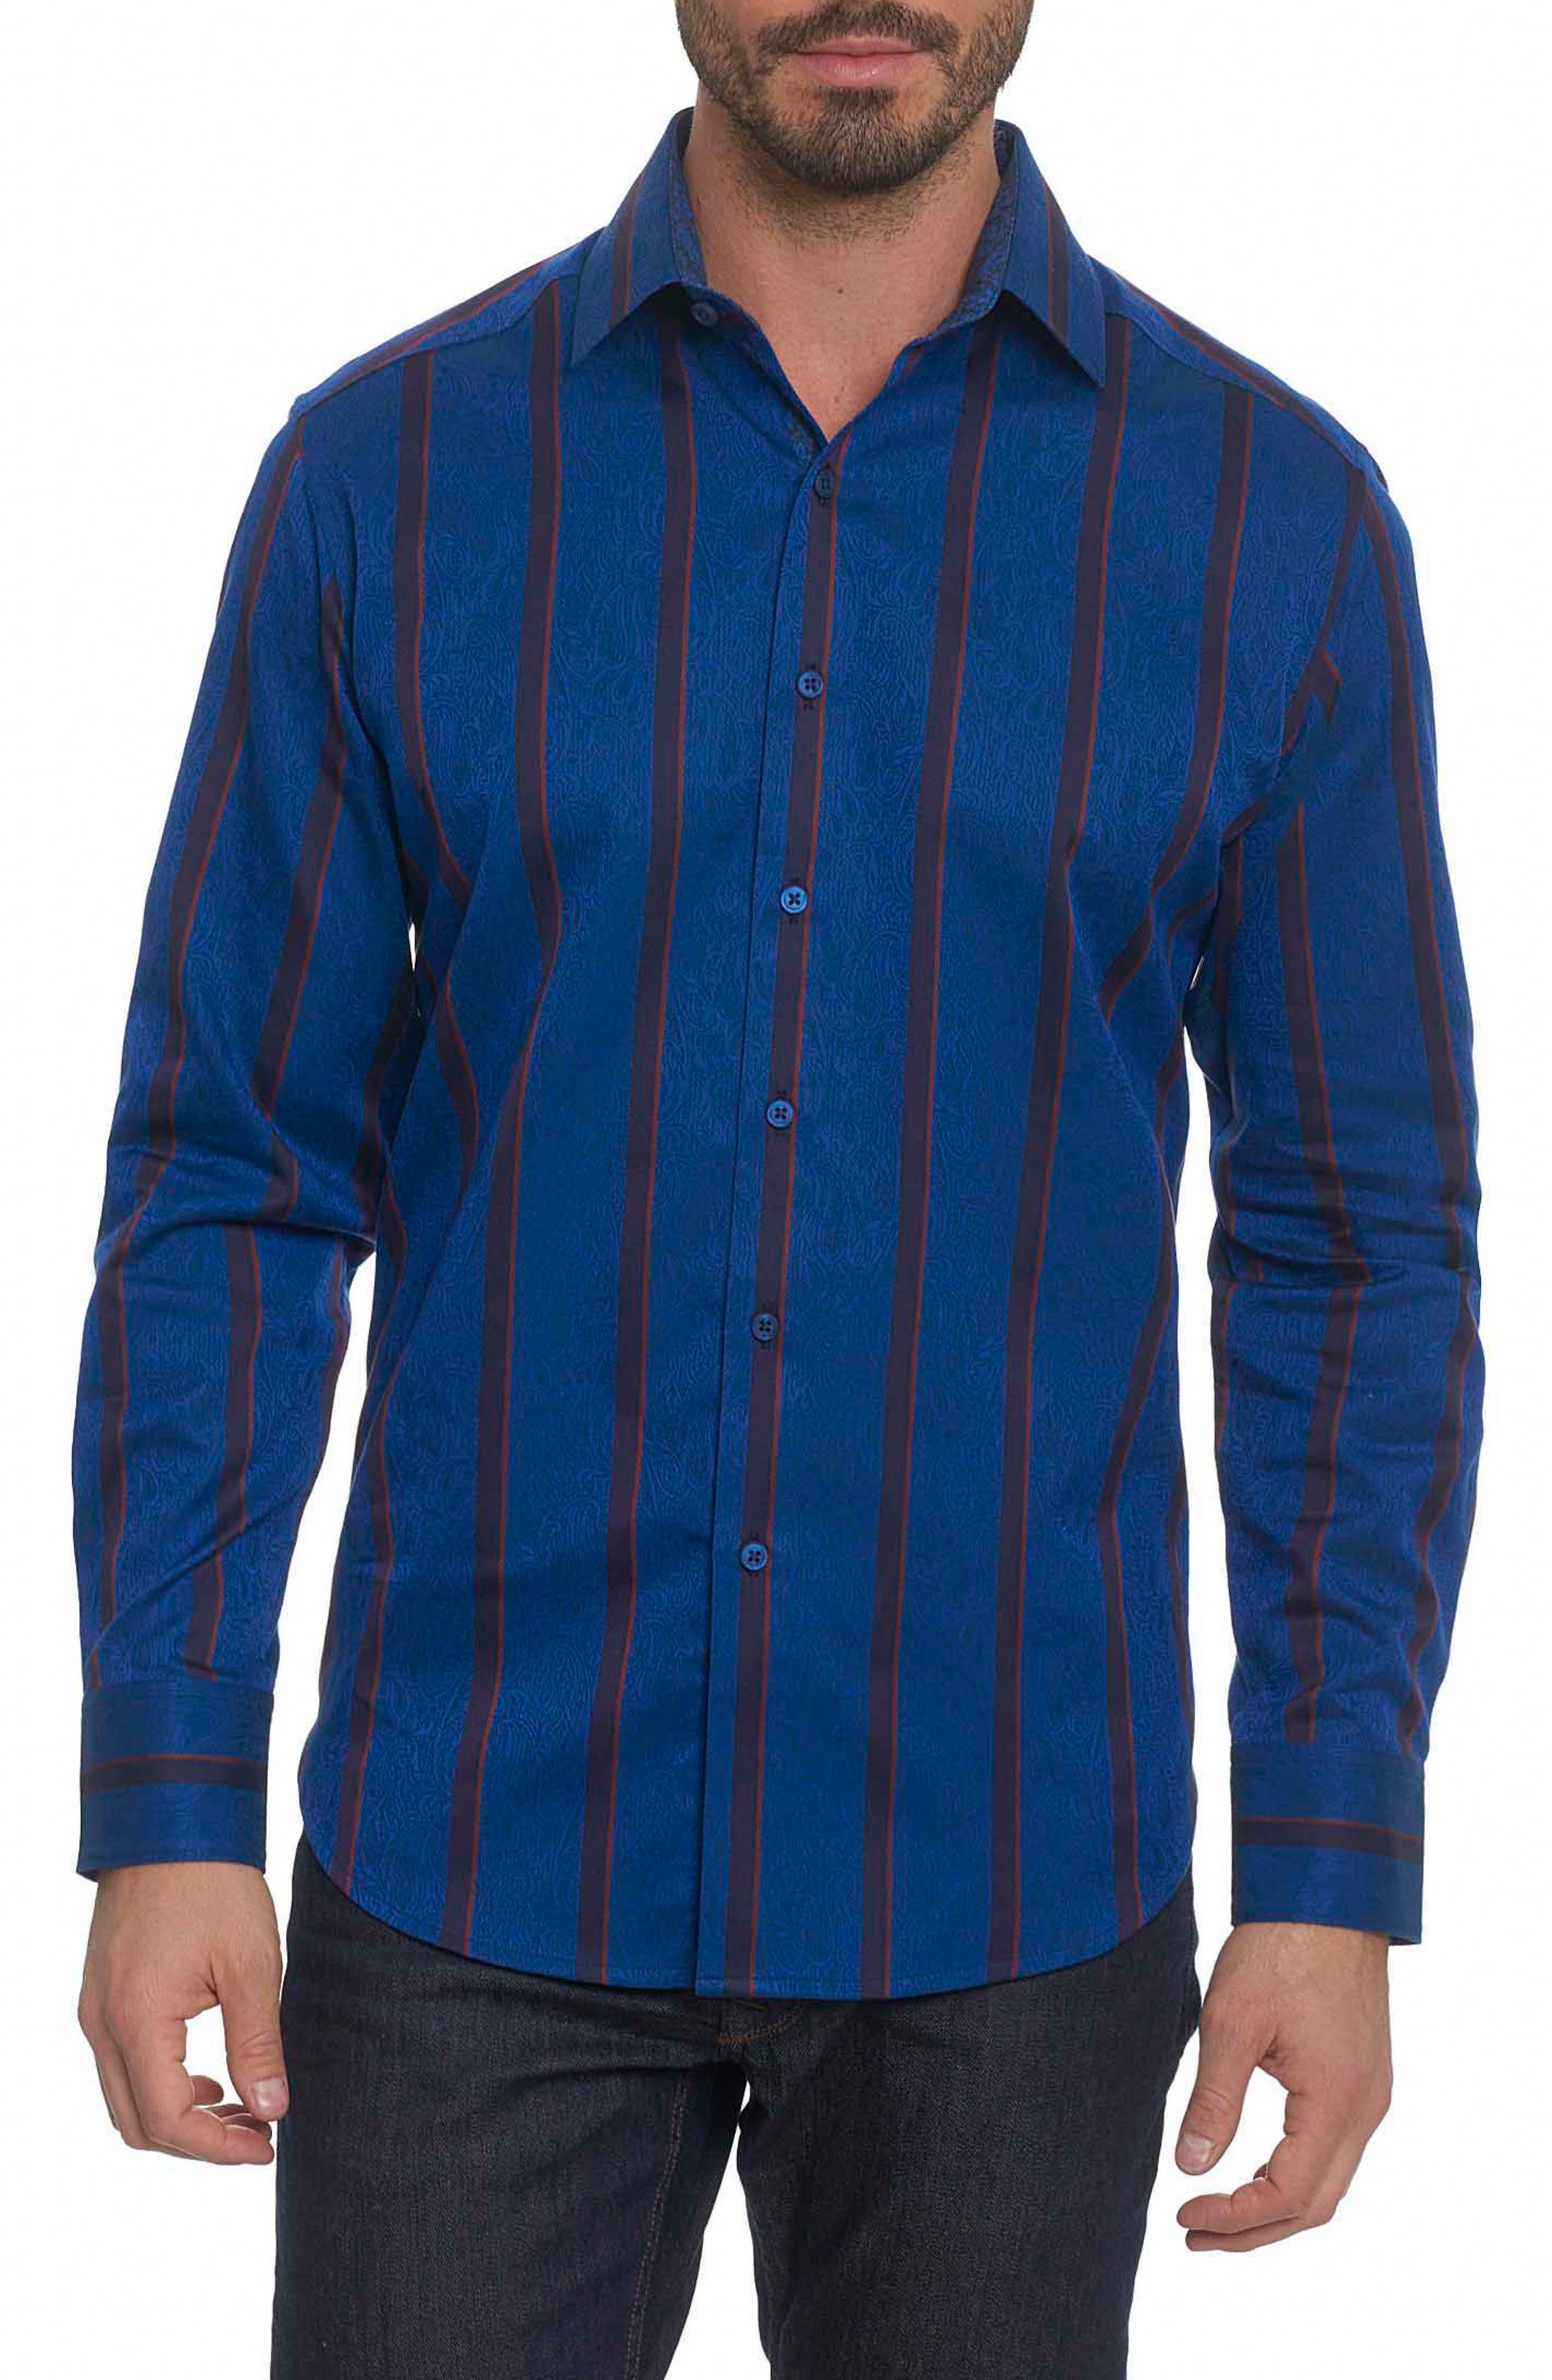 Main Image - Robert Graham Granby Classic Fit Stripe Paisley Sport Shirt